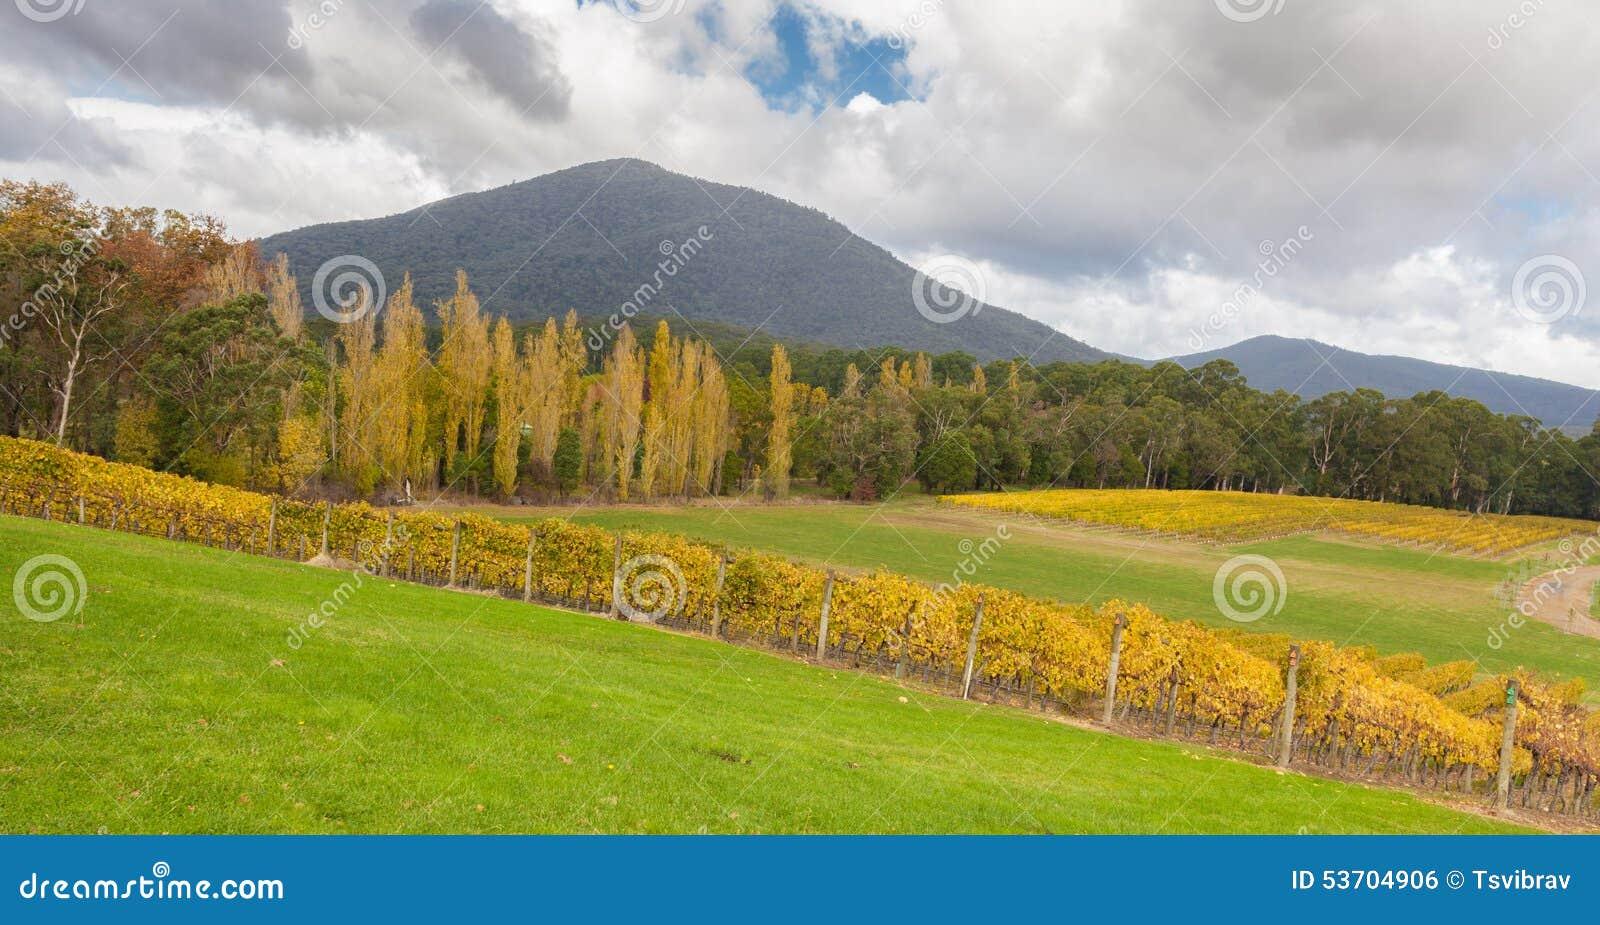 Landscape of vineyard fields in yarra valley australia in for Garden design yarra valley